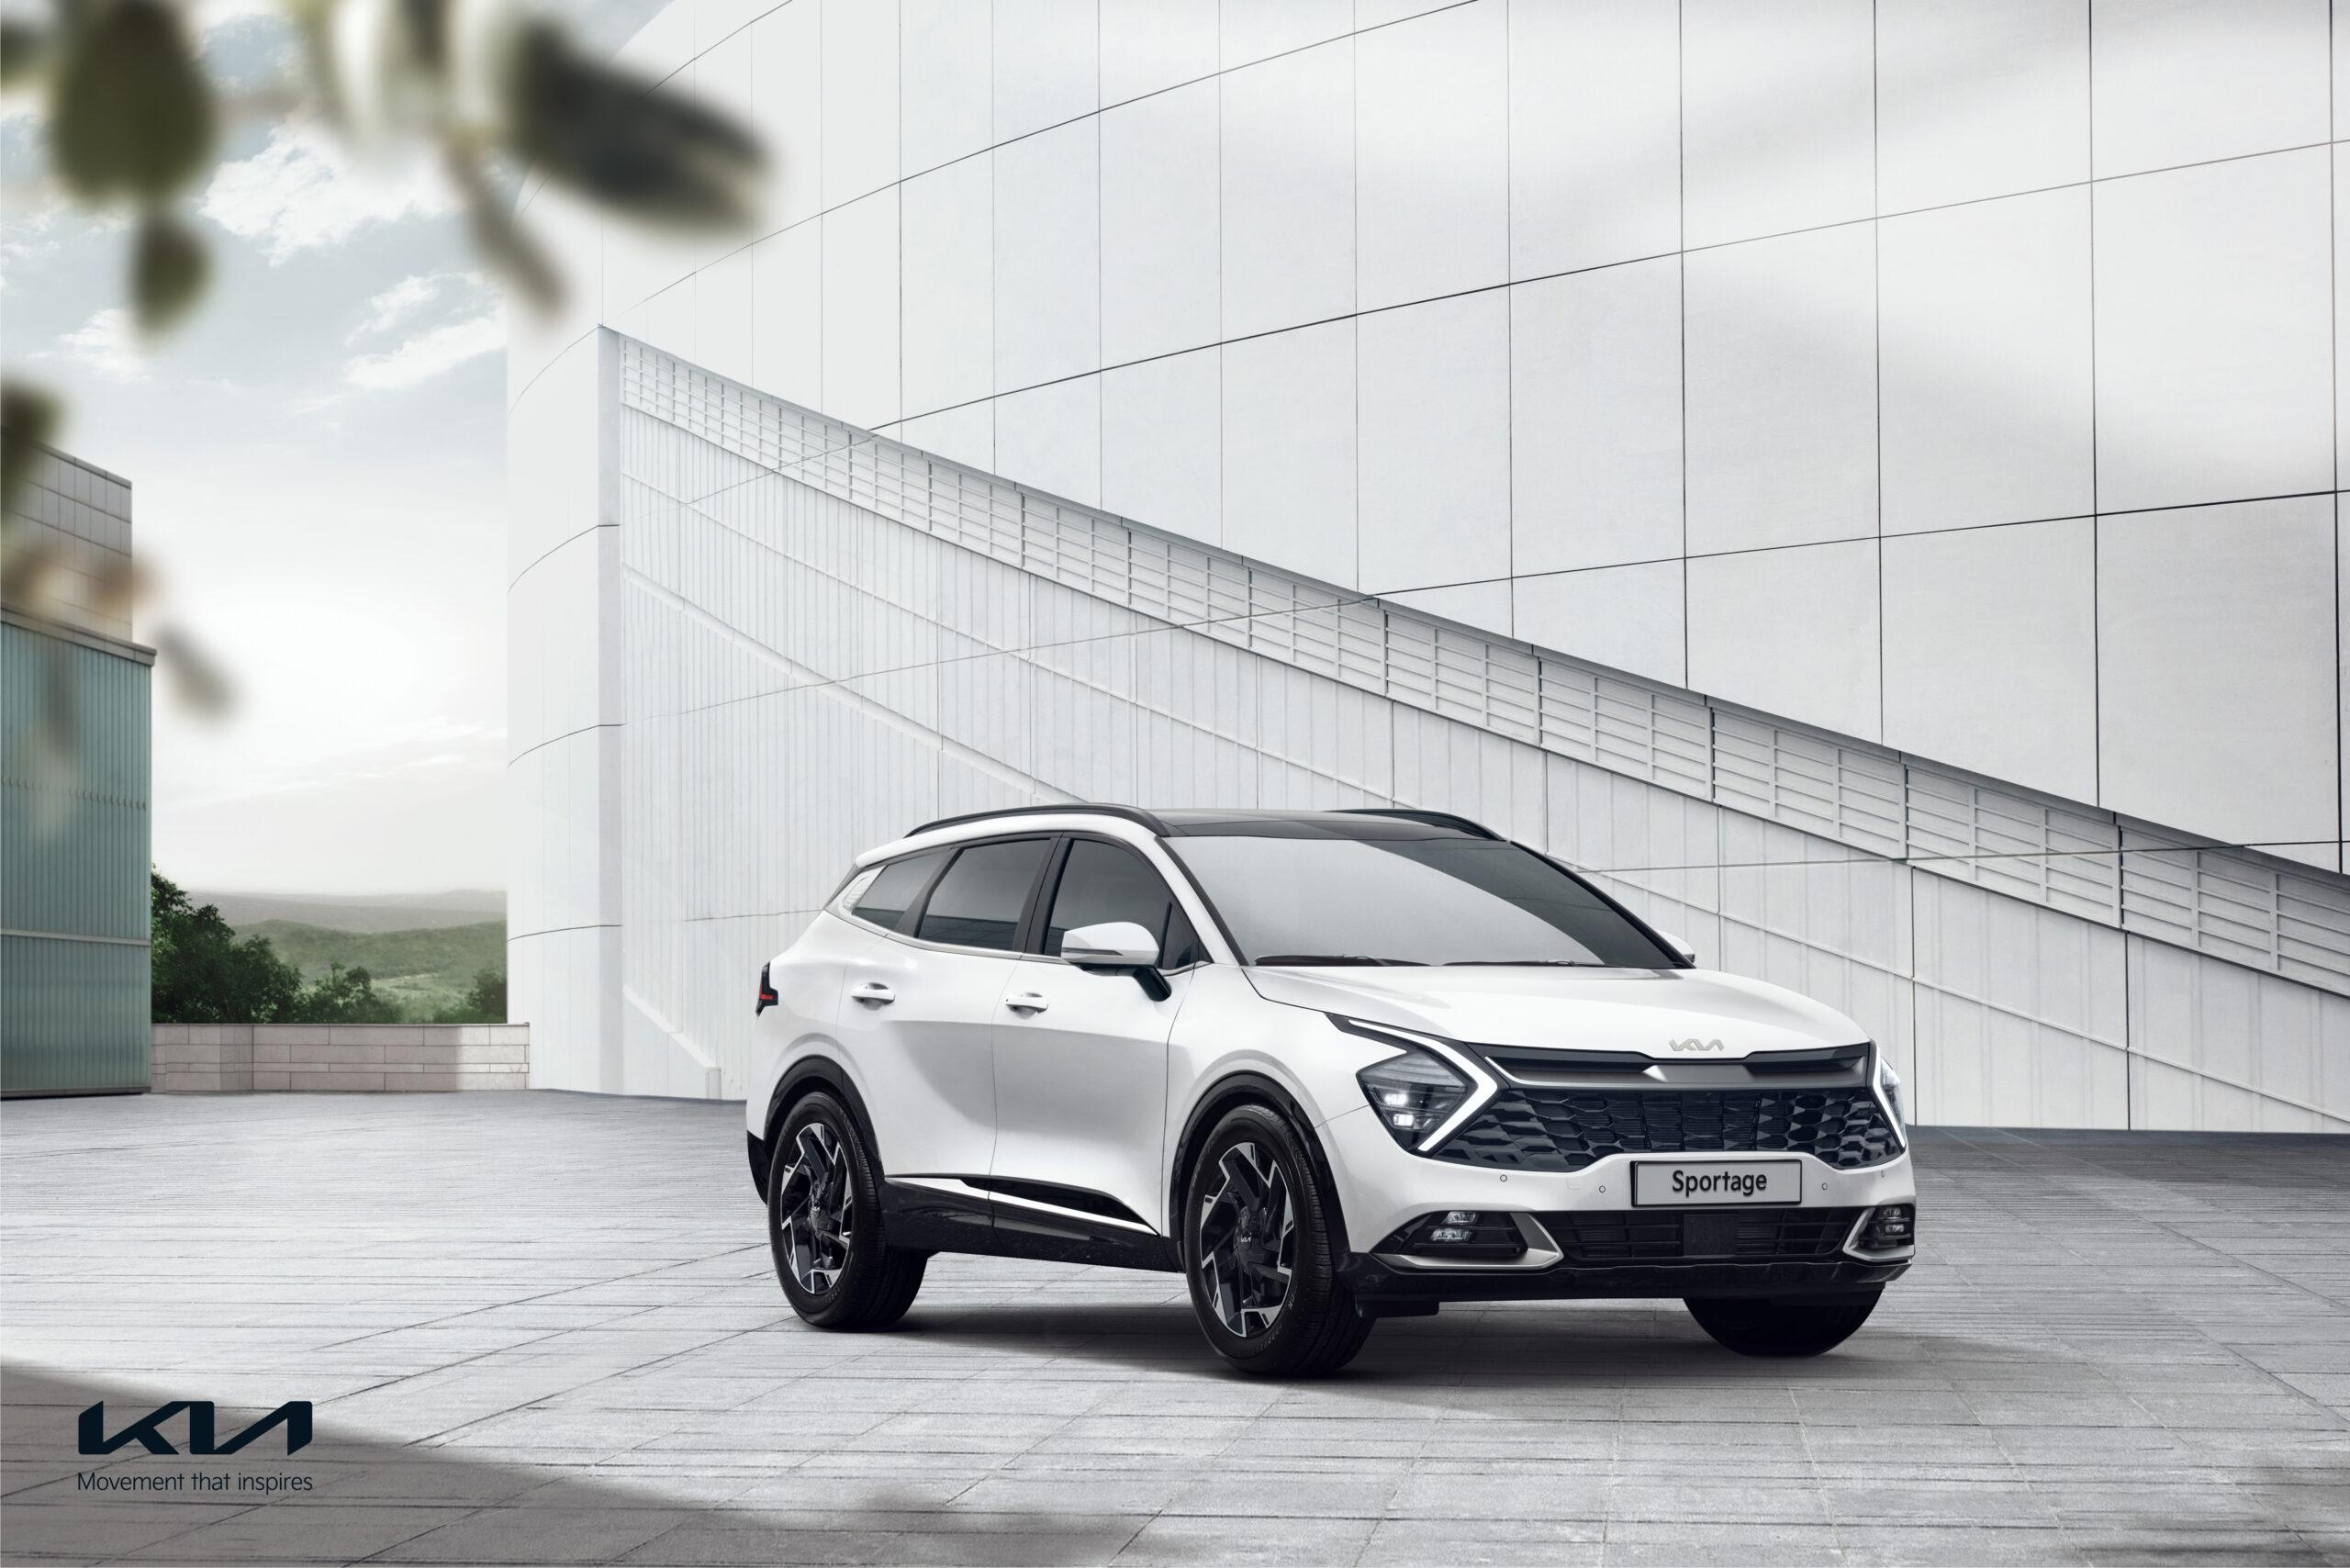 Kia Sportage sets new standards